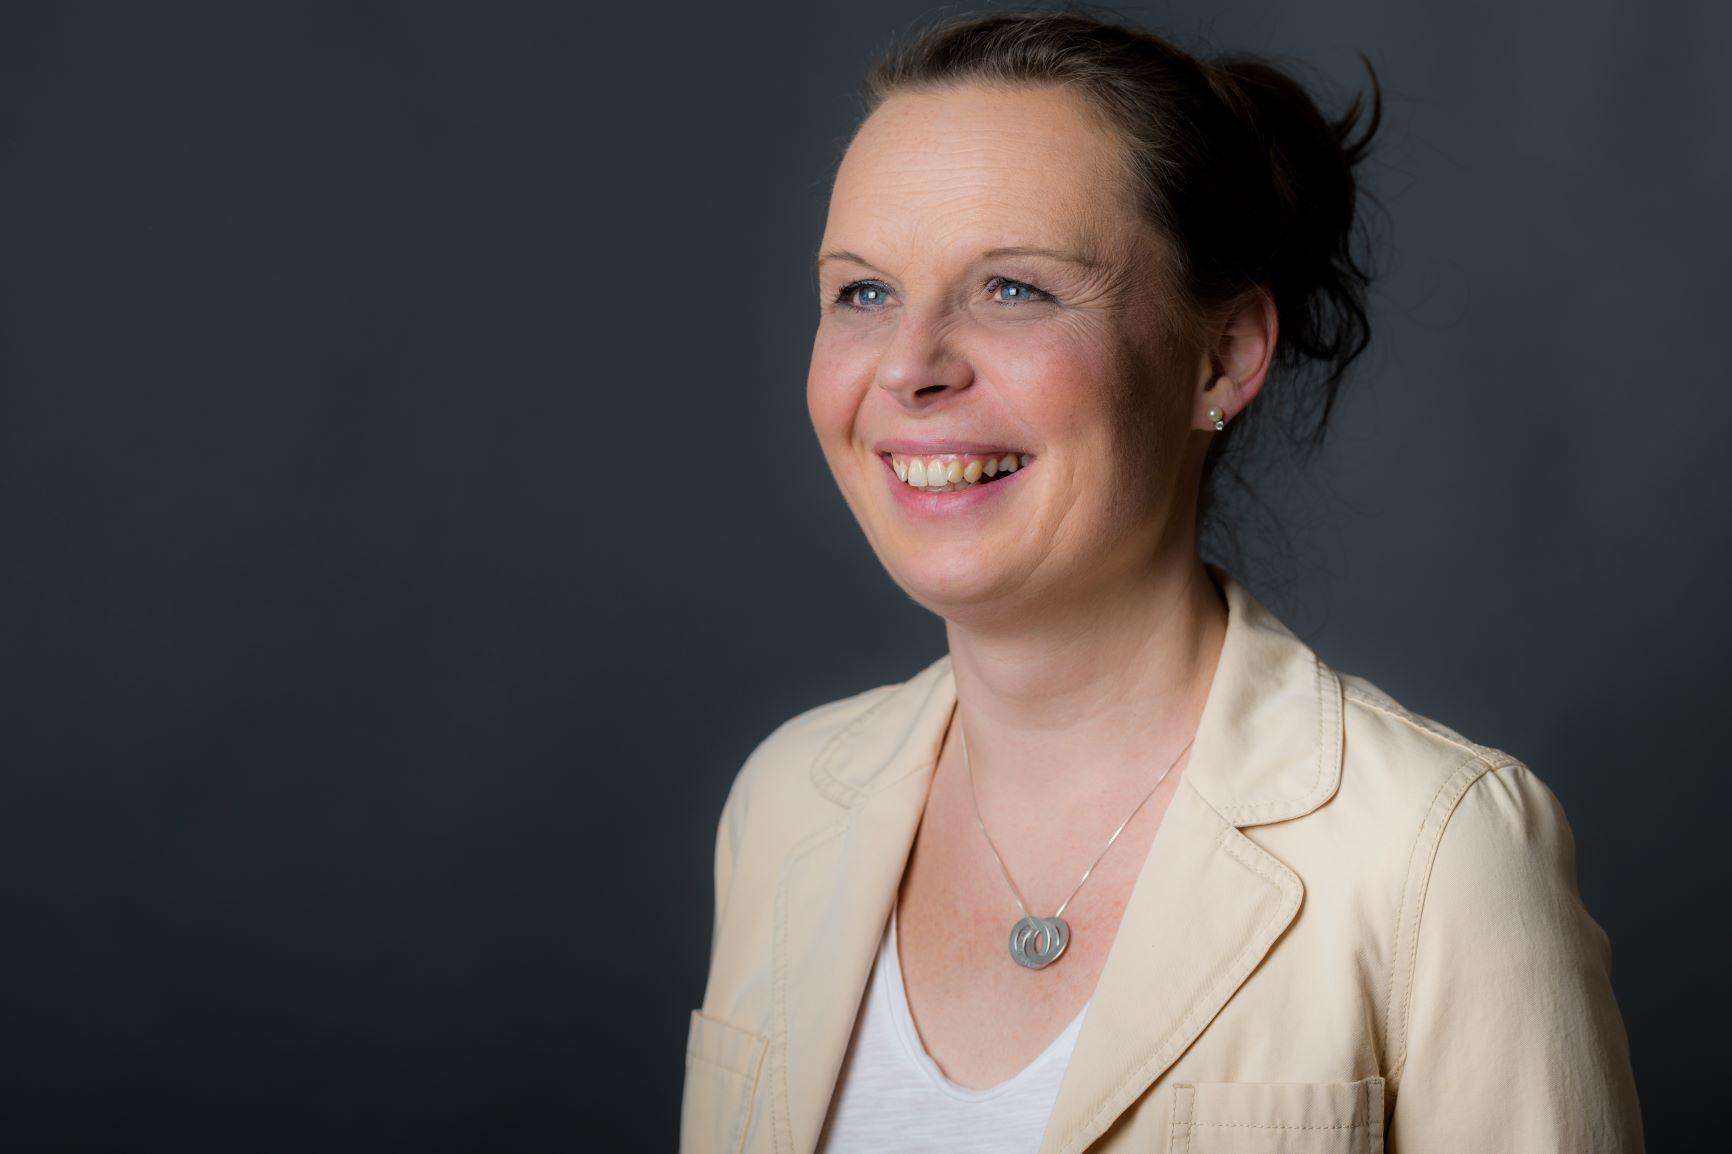 Katrin-Kremp-mobibu-Onlineshop-ueber-uns